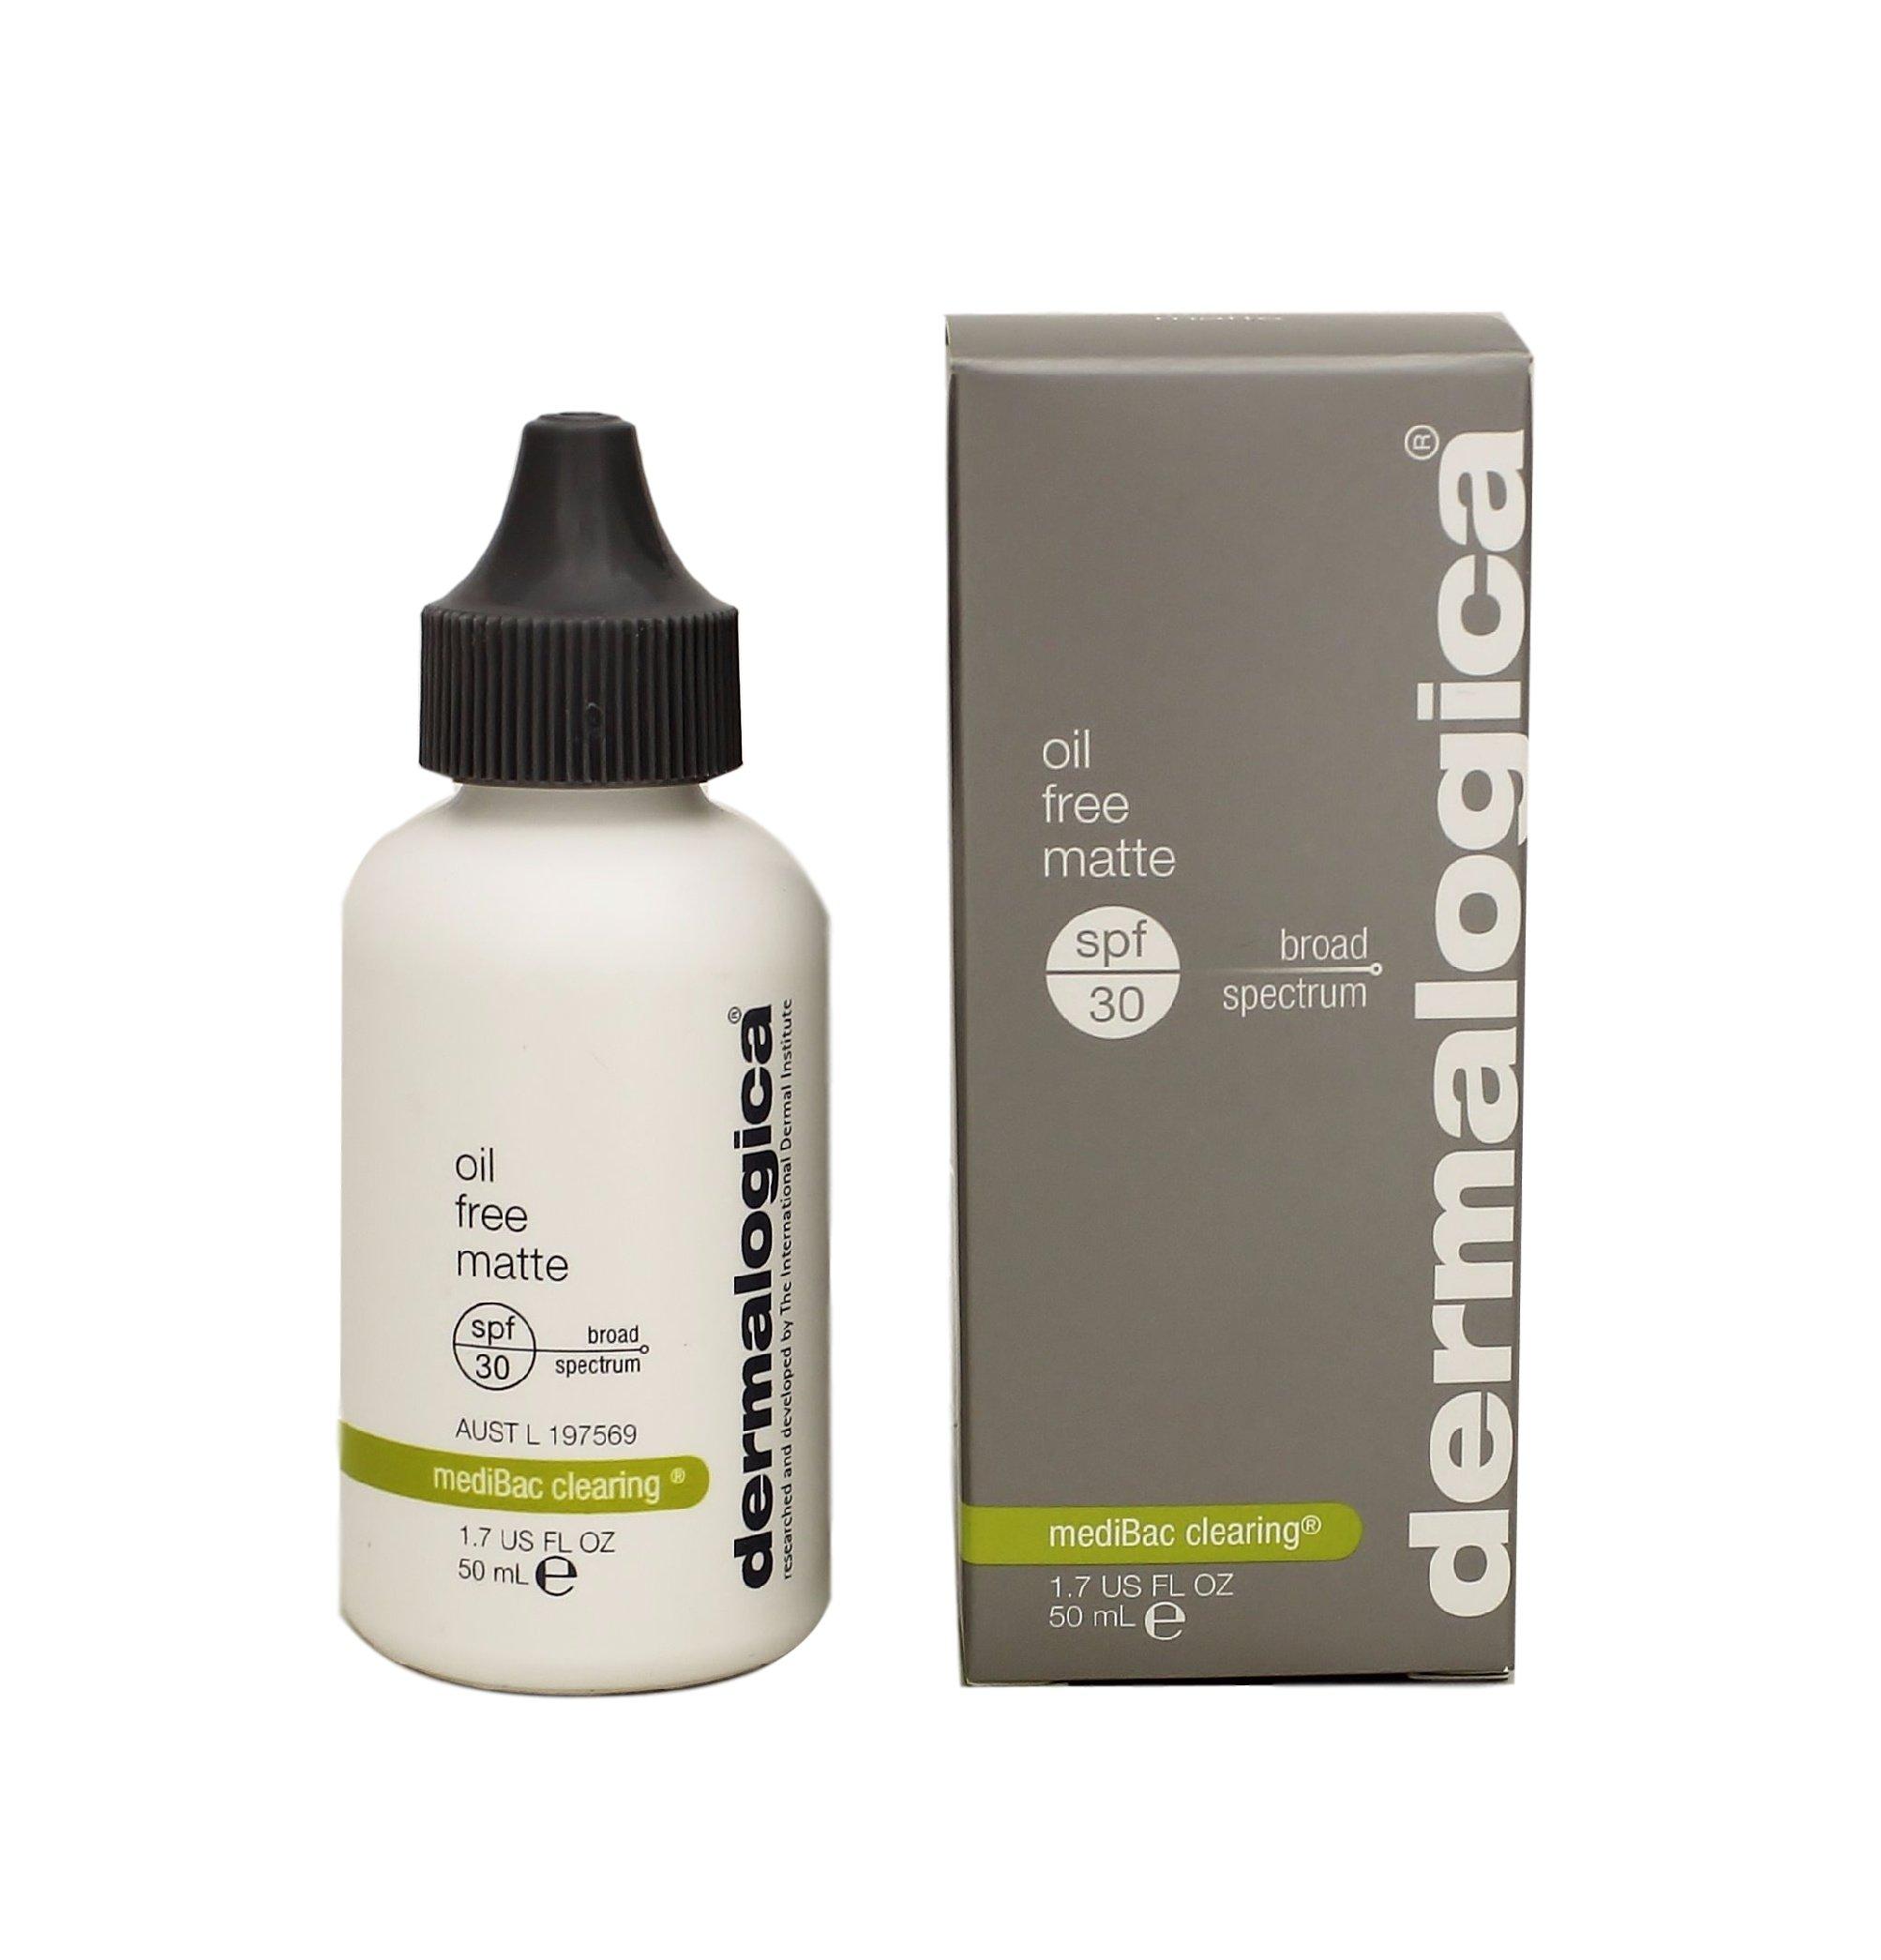 Dermalogica Oil Free Matte Sunscreen Lotion SPF 30, 1.7 Fluid Ounce